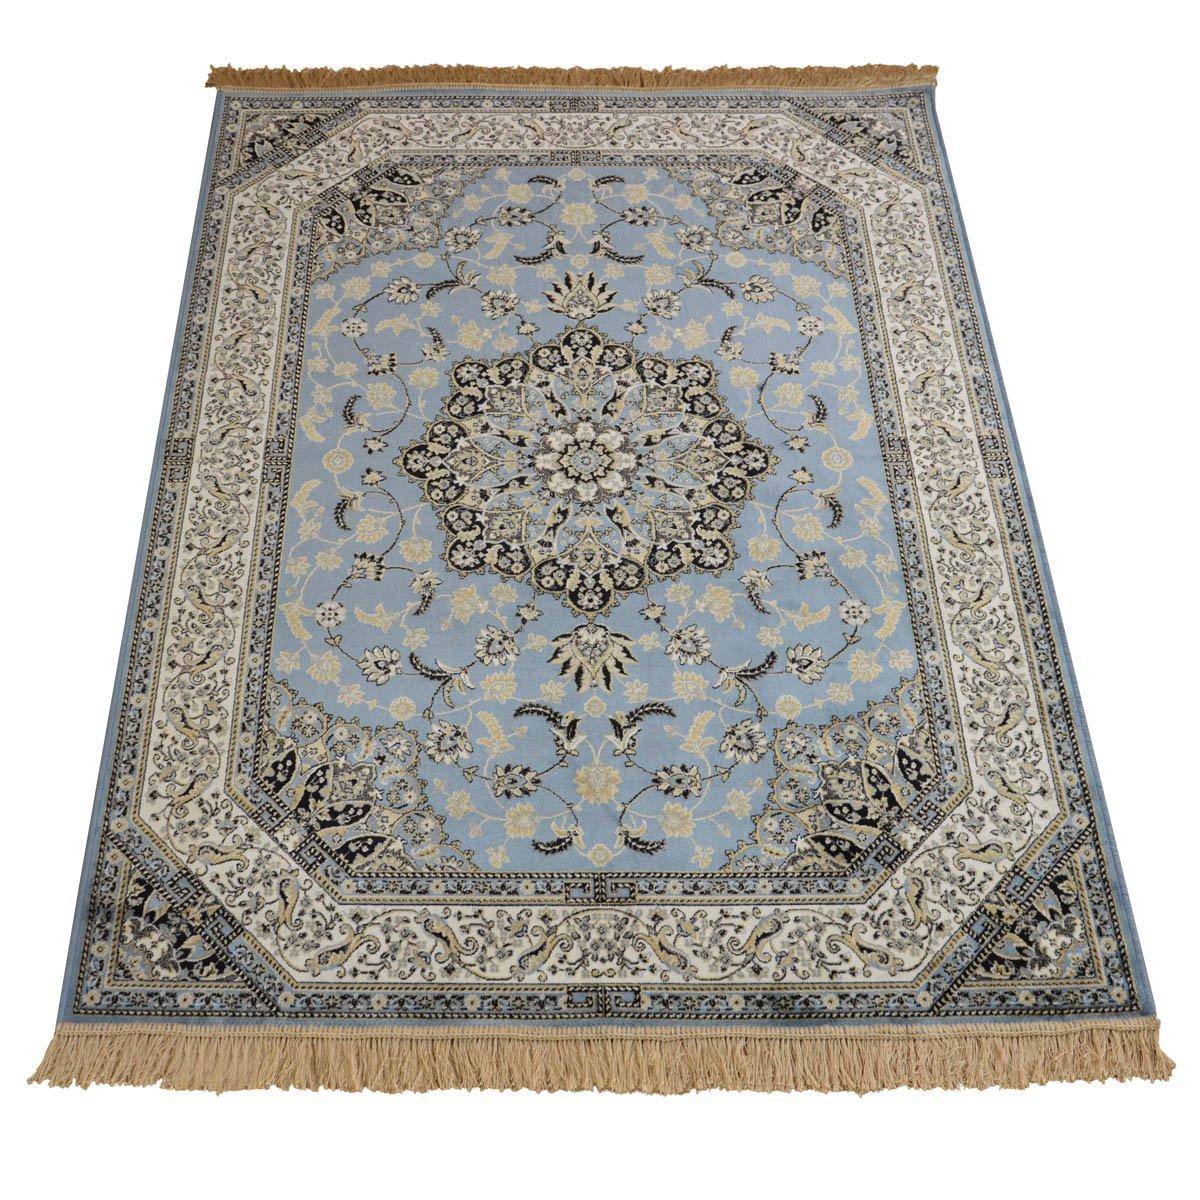 WEBTAPPETI Orientteppich Position klassisch Teppich RUBINE 317-azzurro Parure hellblau